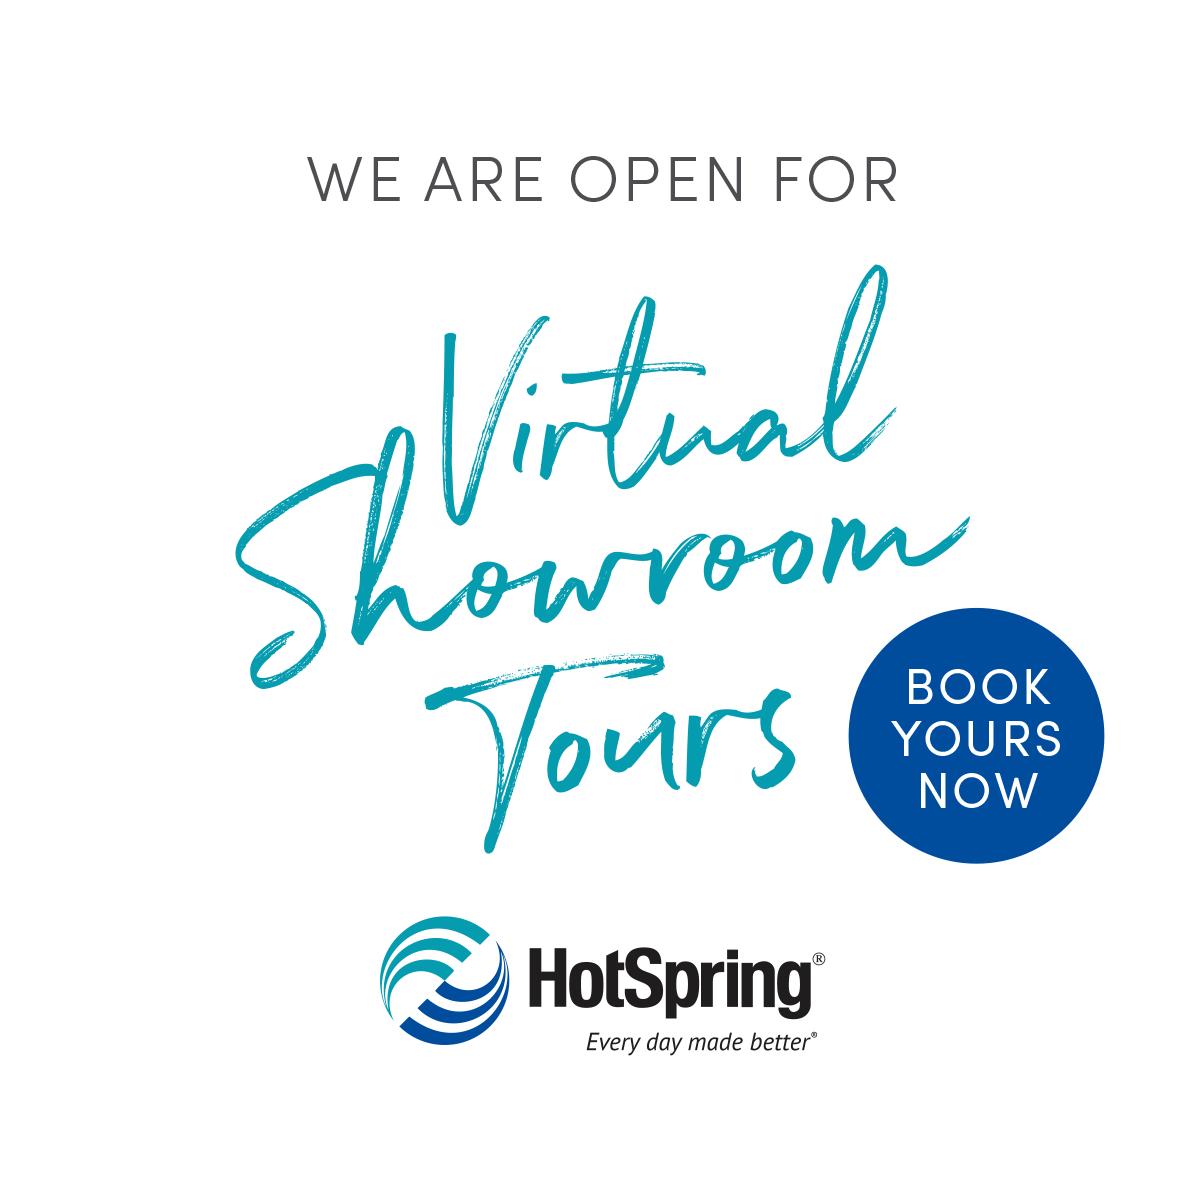 2108-005-LVL4-Virtual-Showroom-Facebook-1200x1200-1